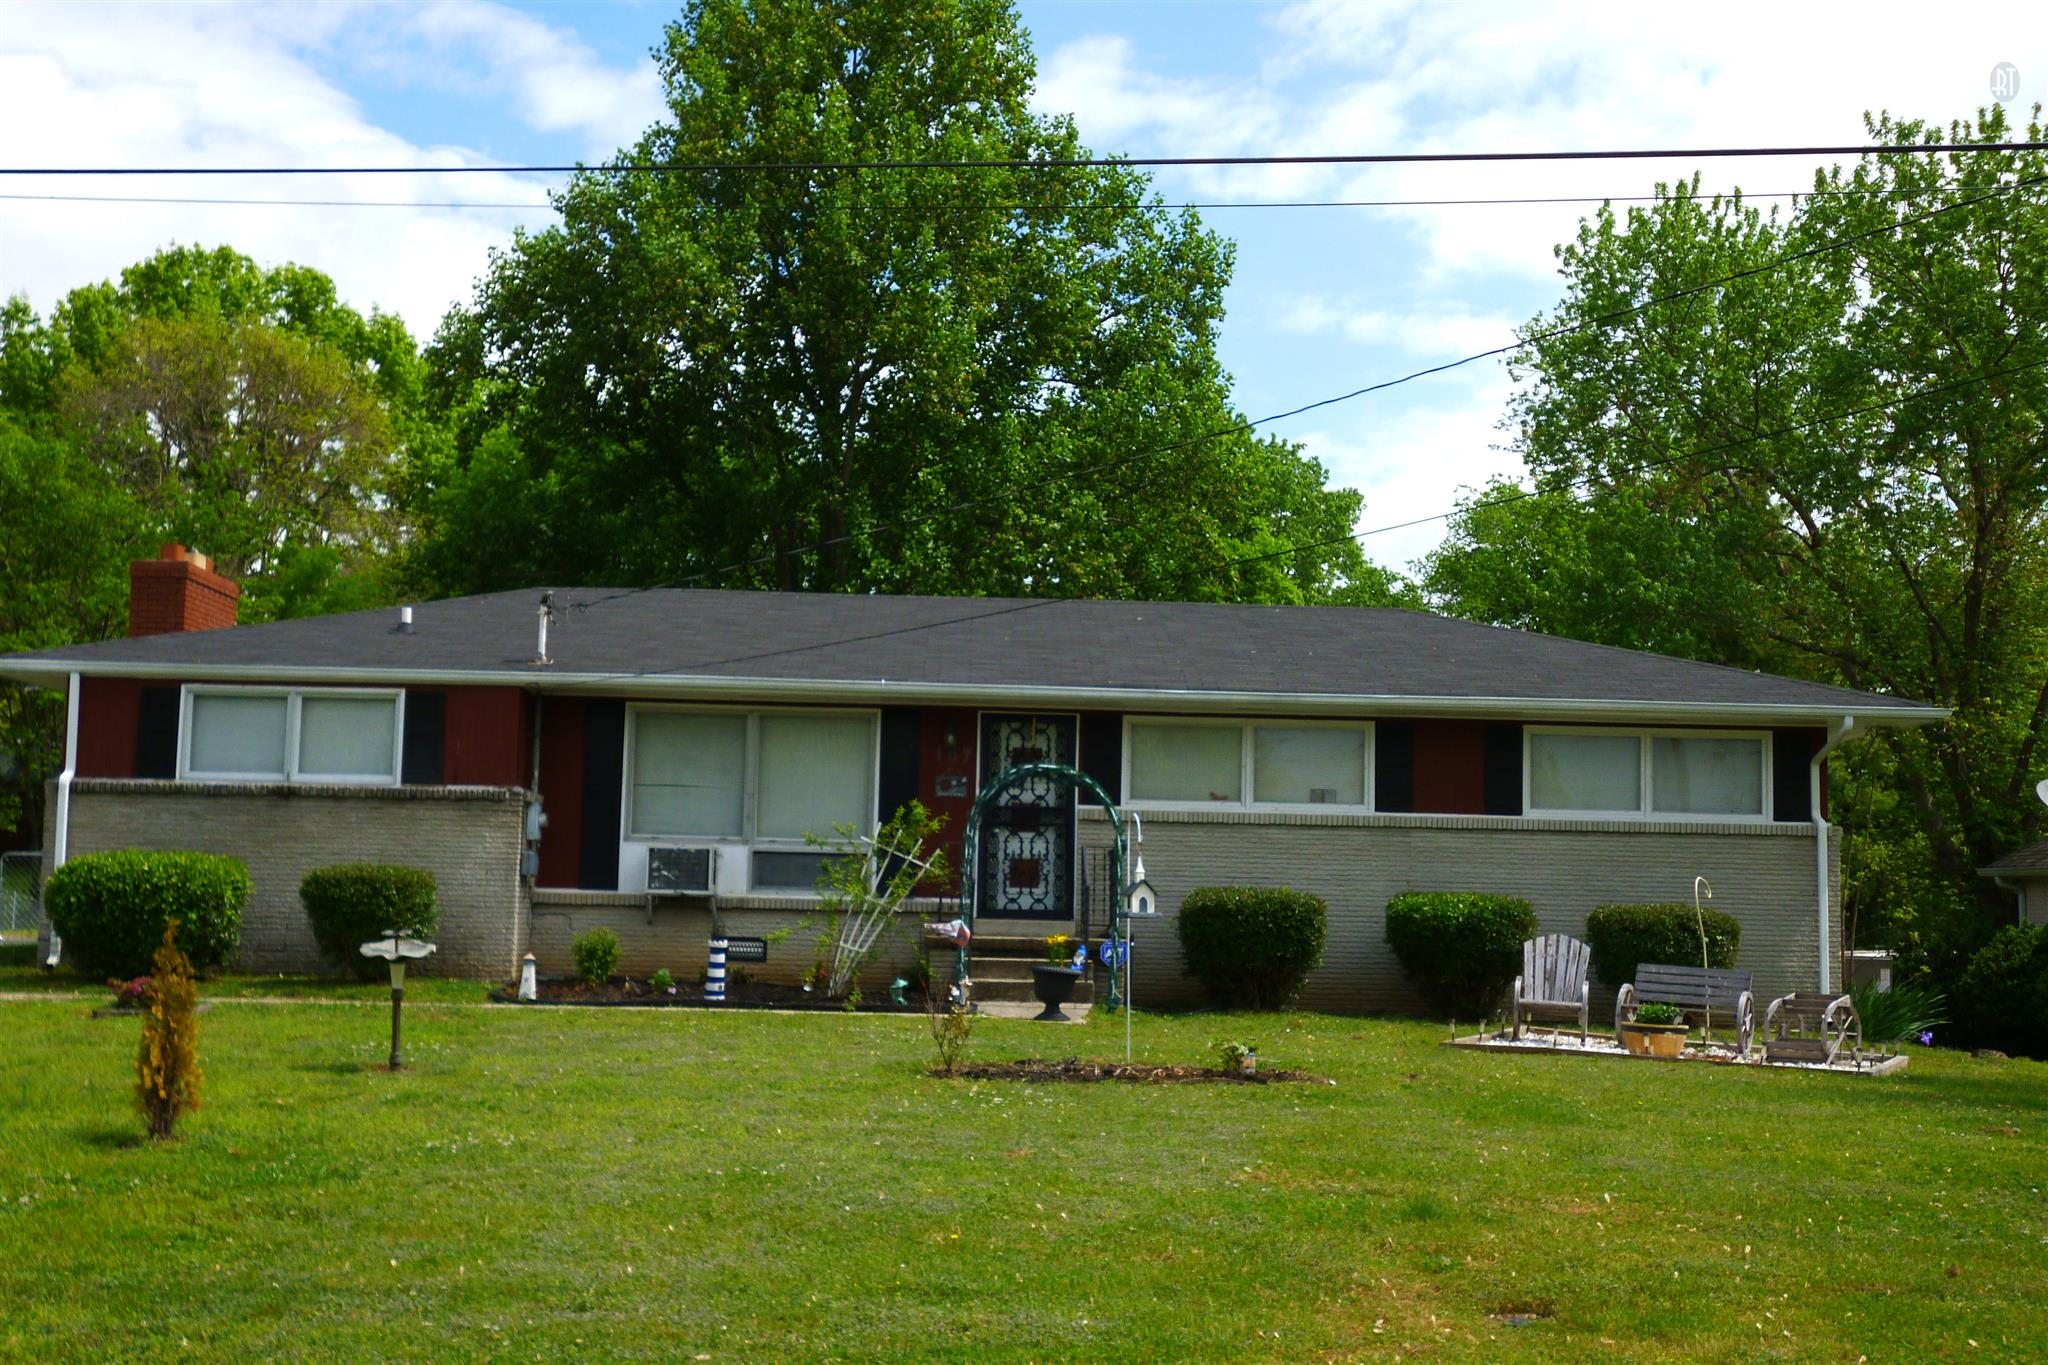 107 Horseshoe Dr, Shelbyville, TN 37160